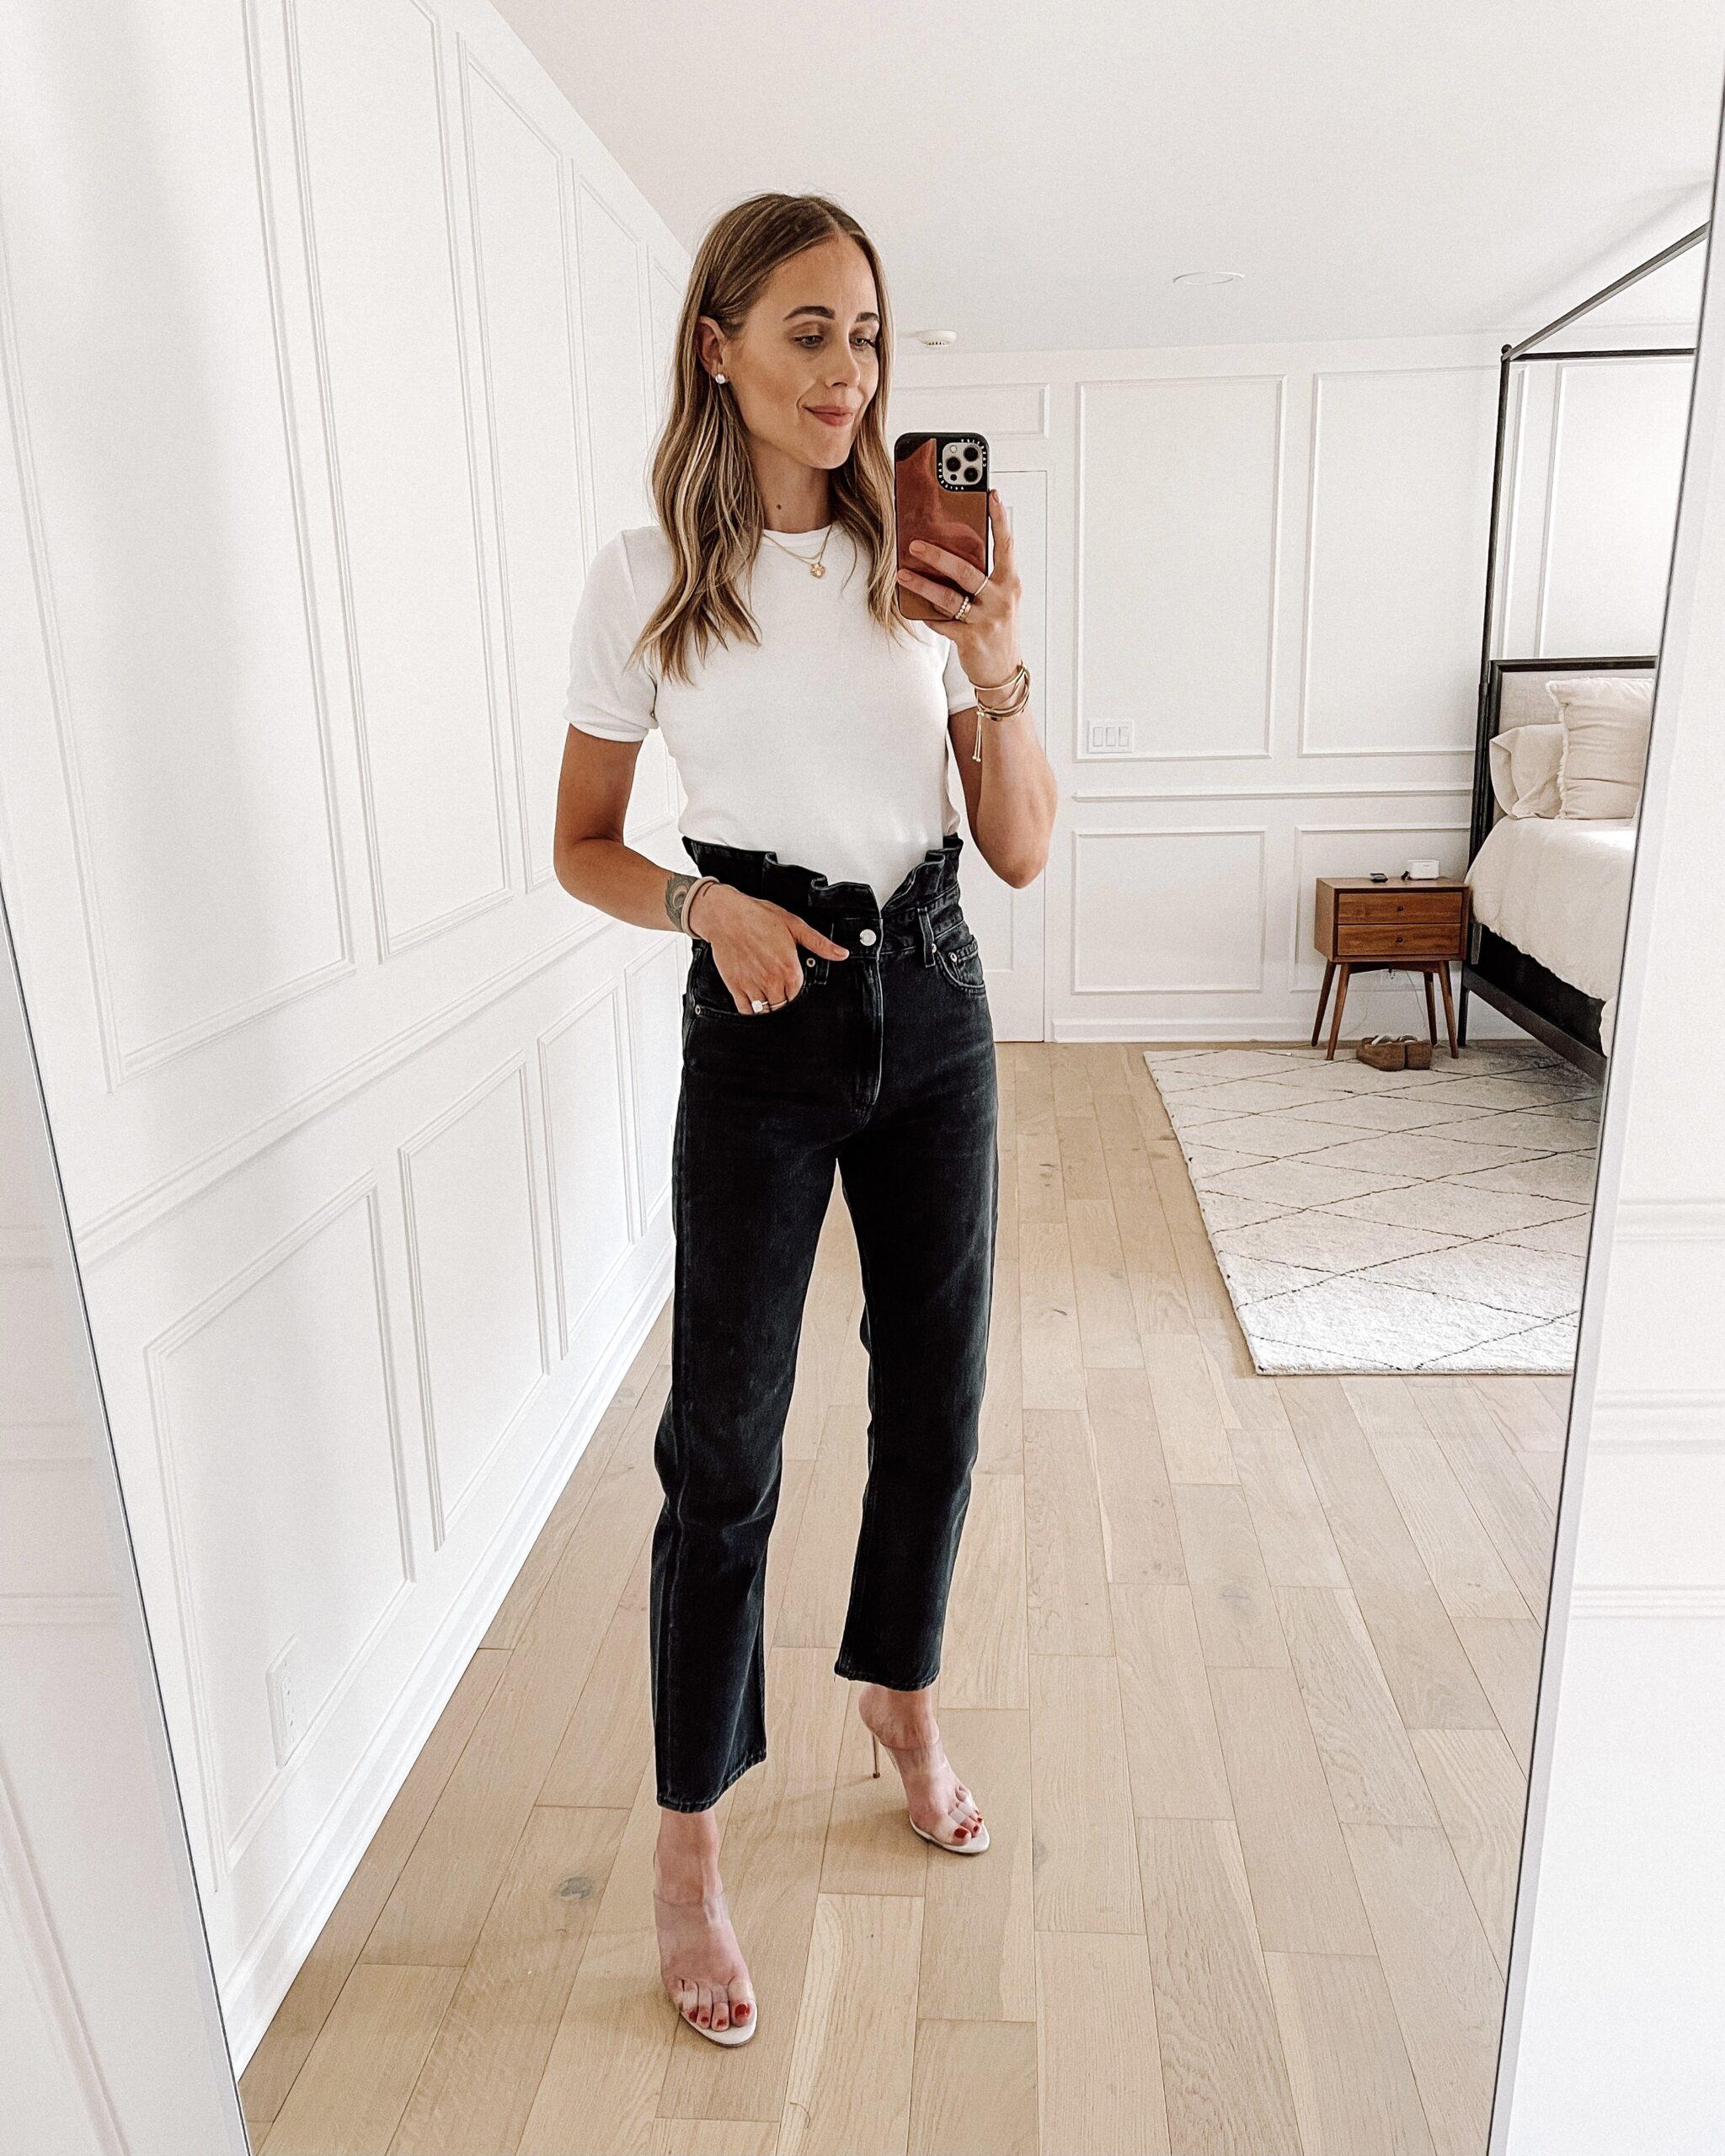 Fashion Jackson Wearing White Top AGOLDE Black Ruffle Waist Jeans Clear Heeled Sandals